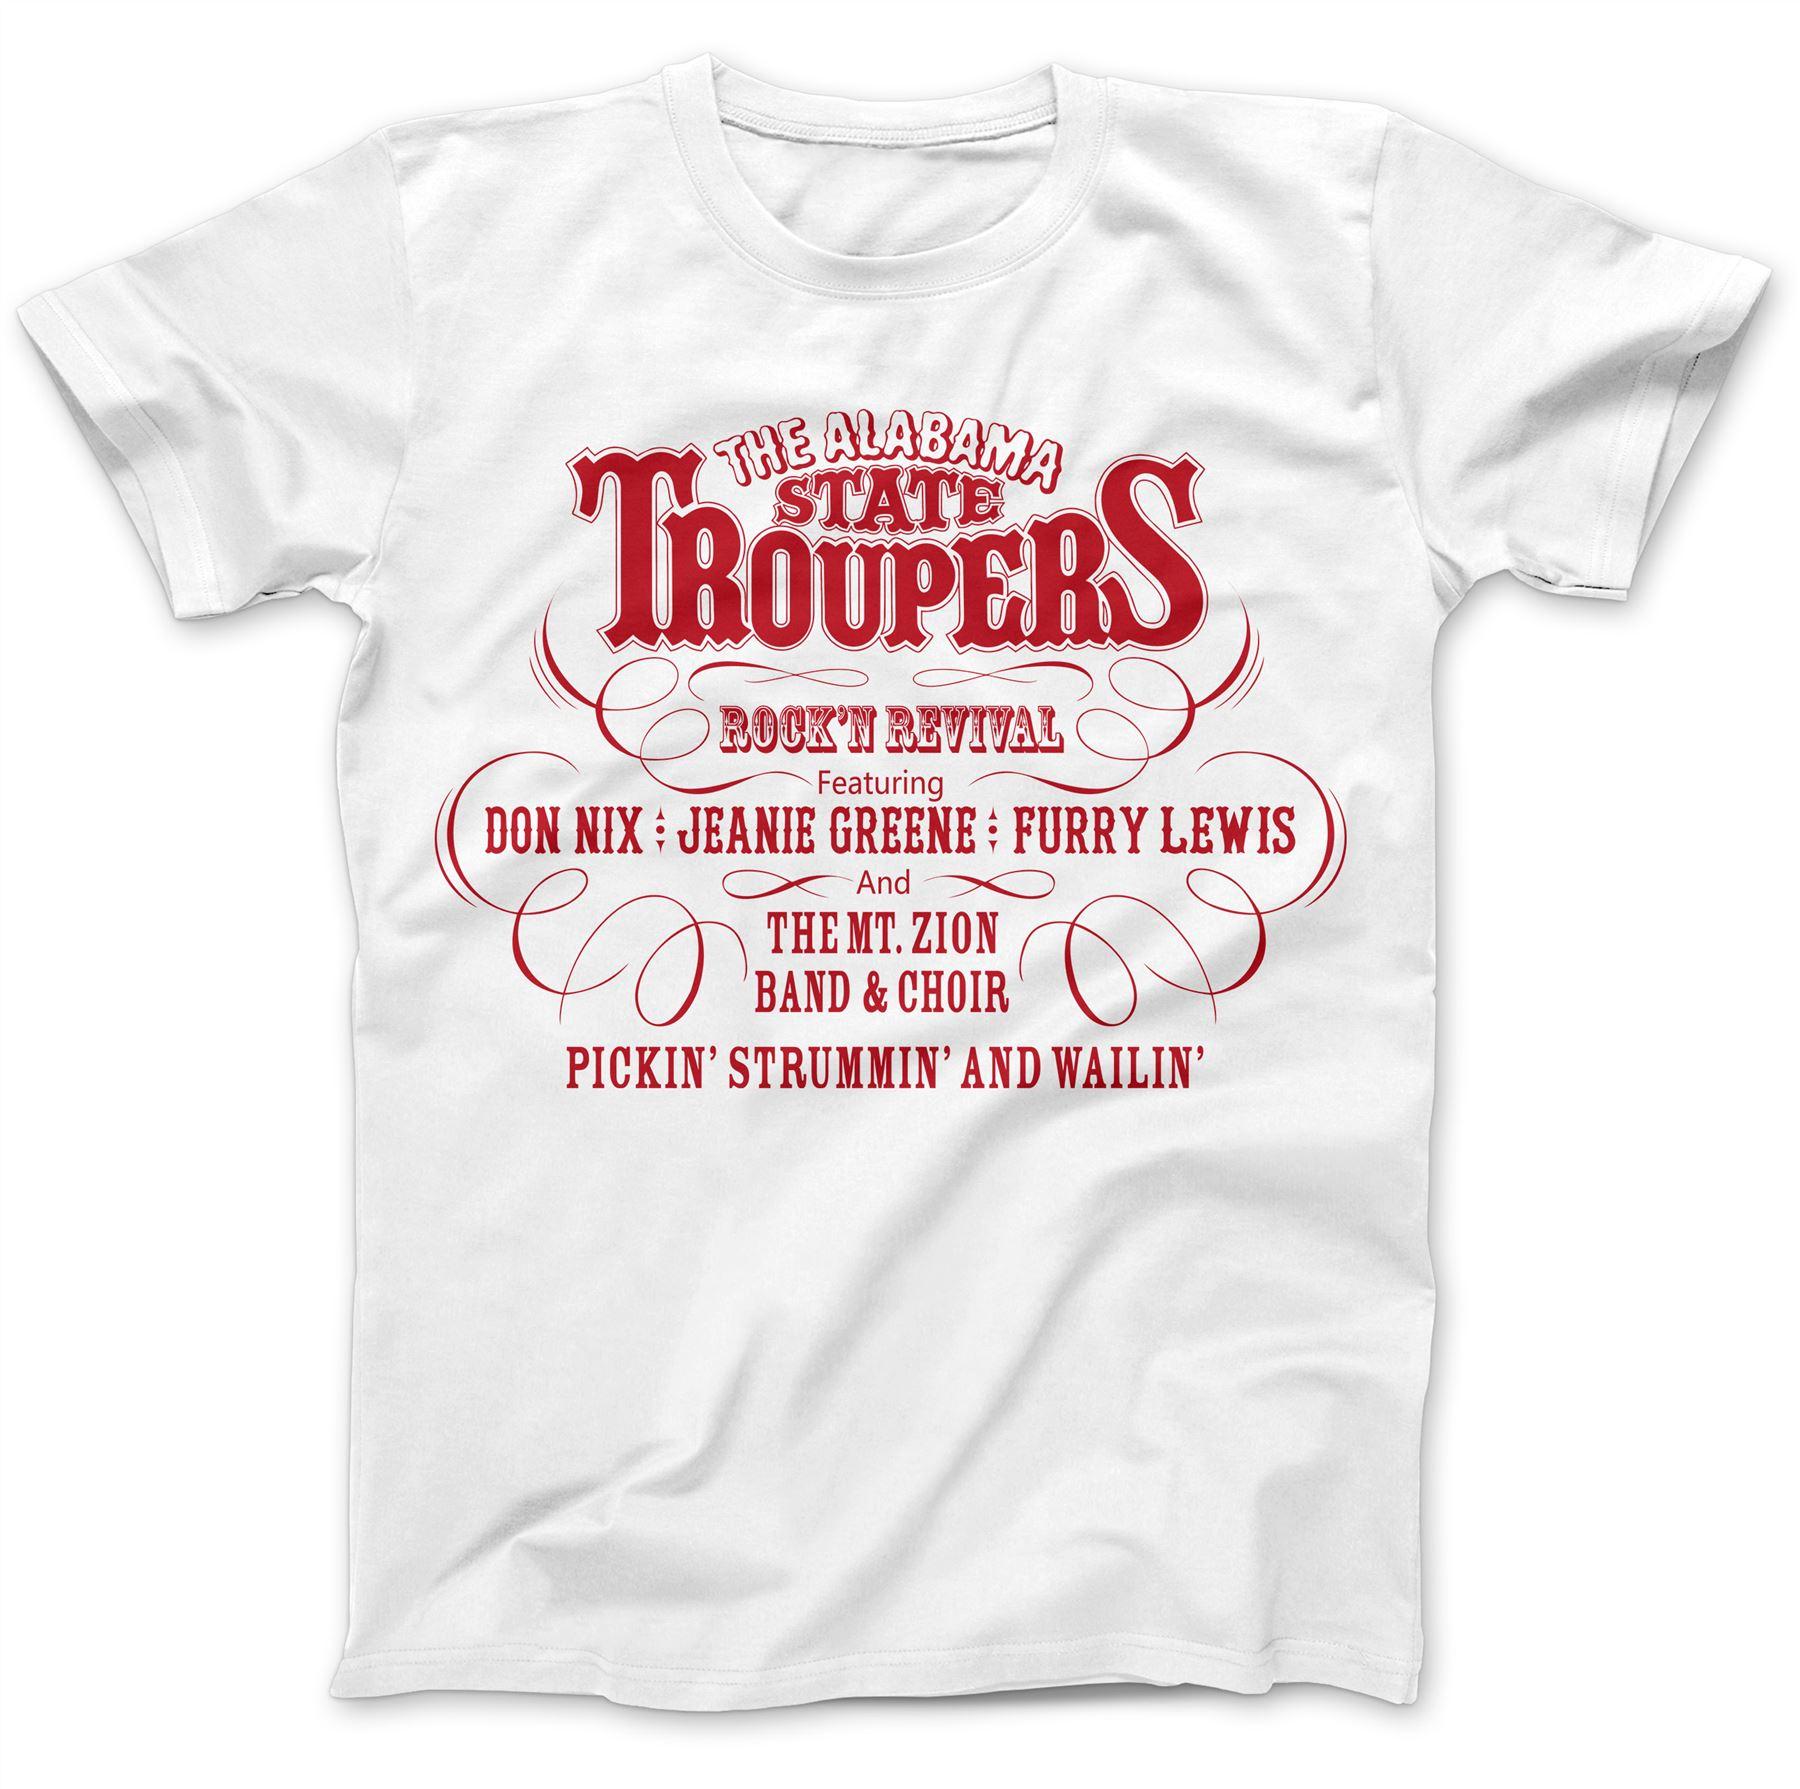 Buy paul jones shirt and free shipping on AliExpress